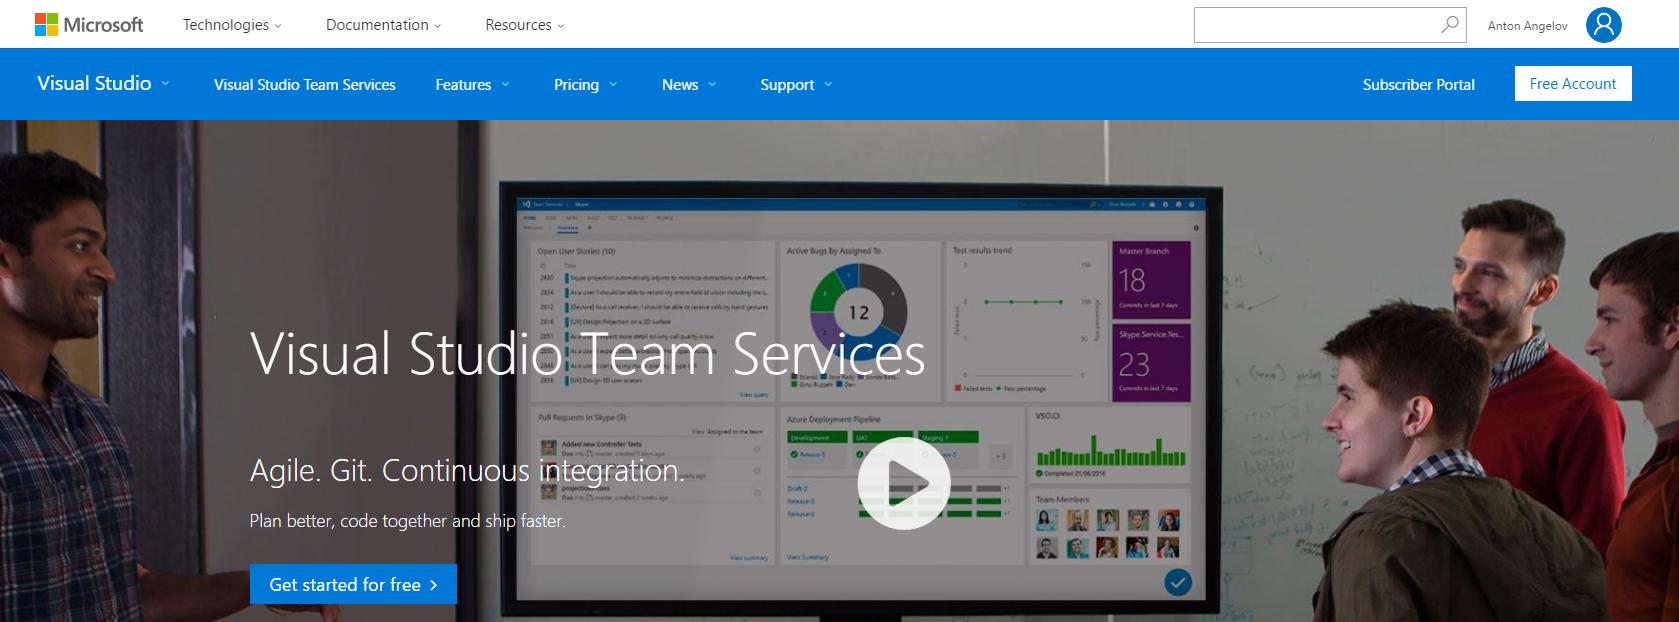 Visual Studio Online Services